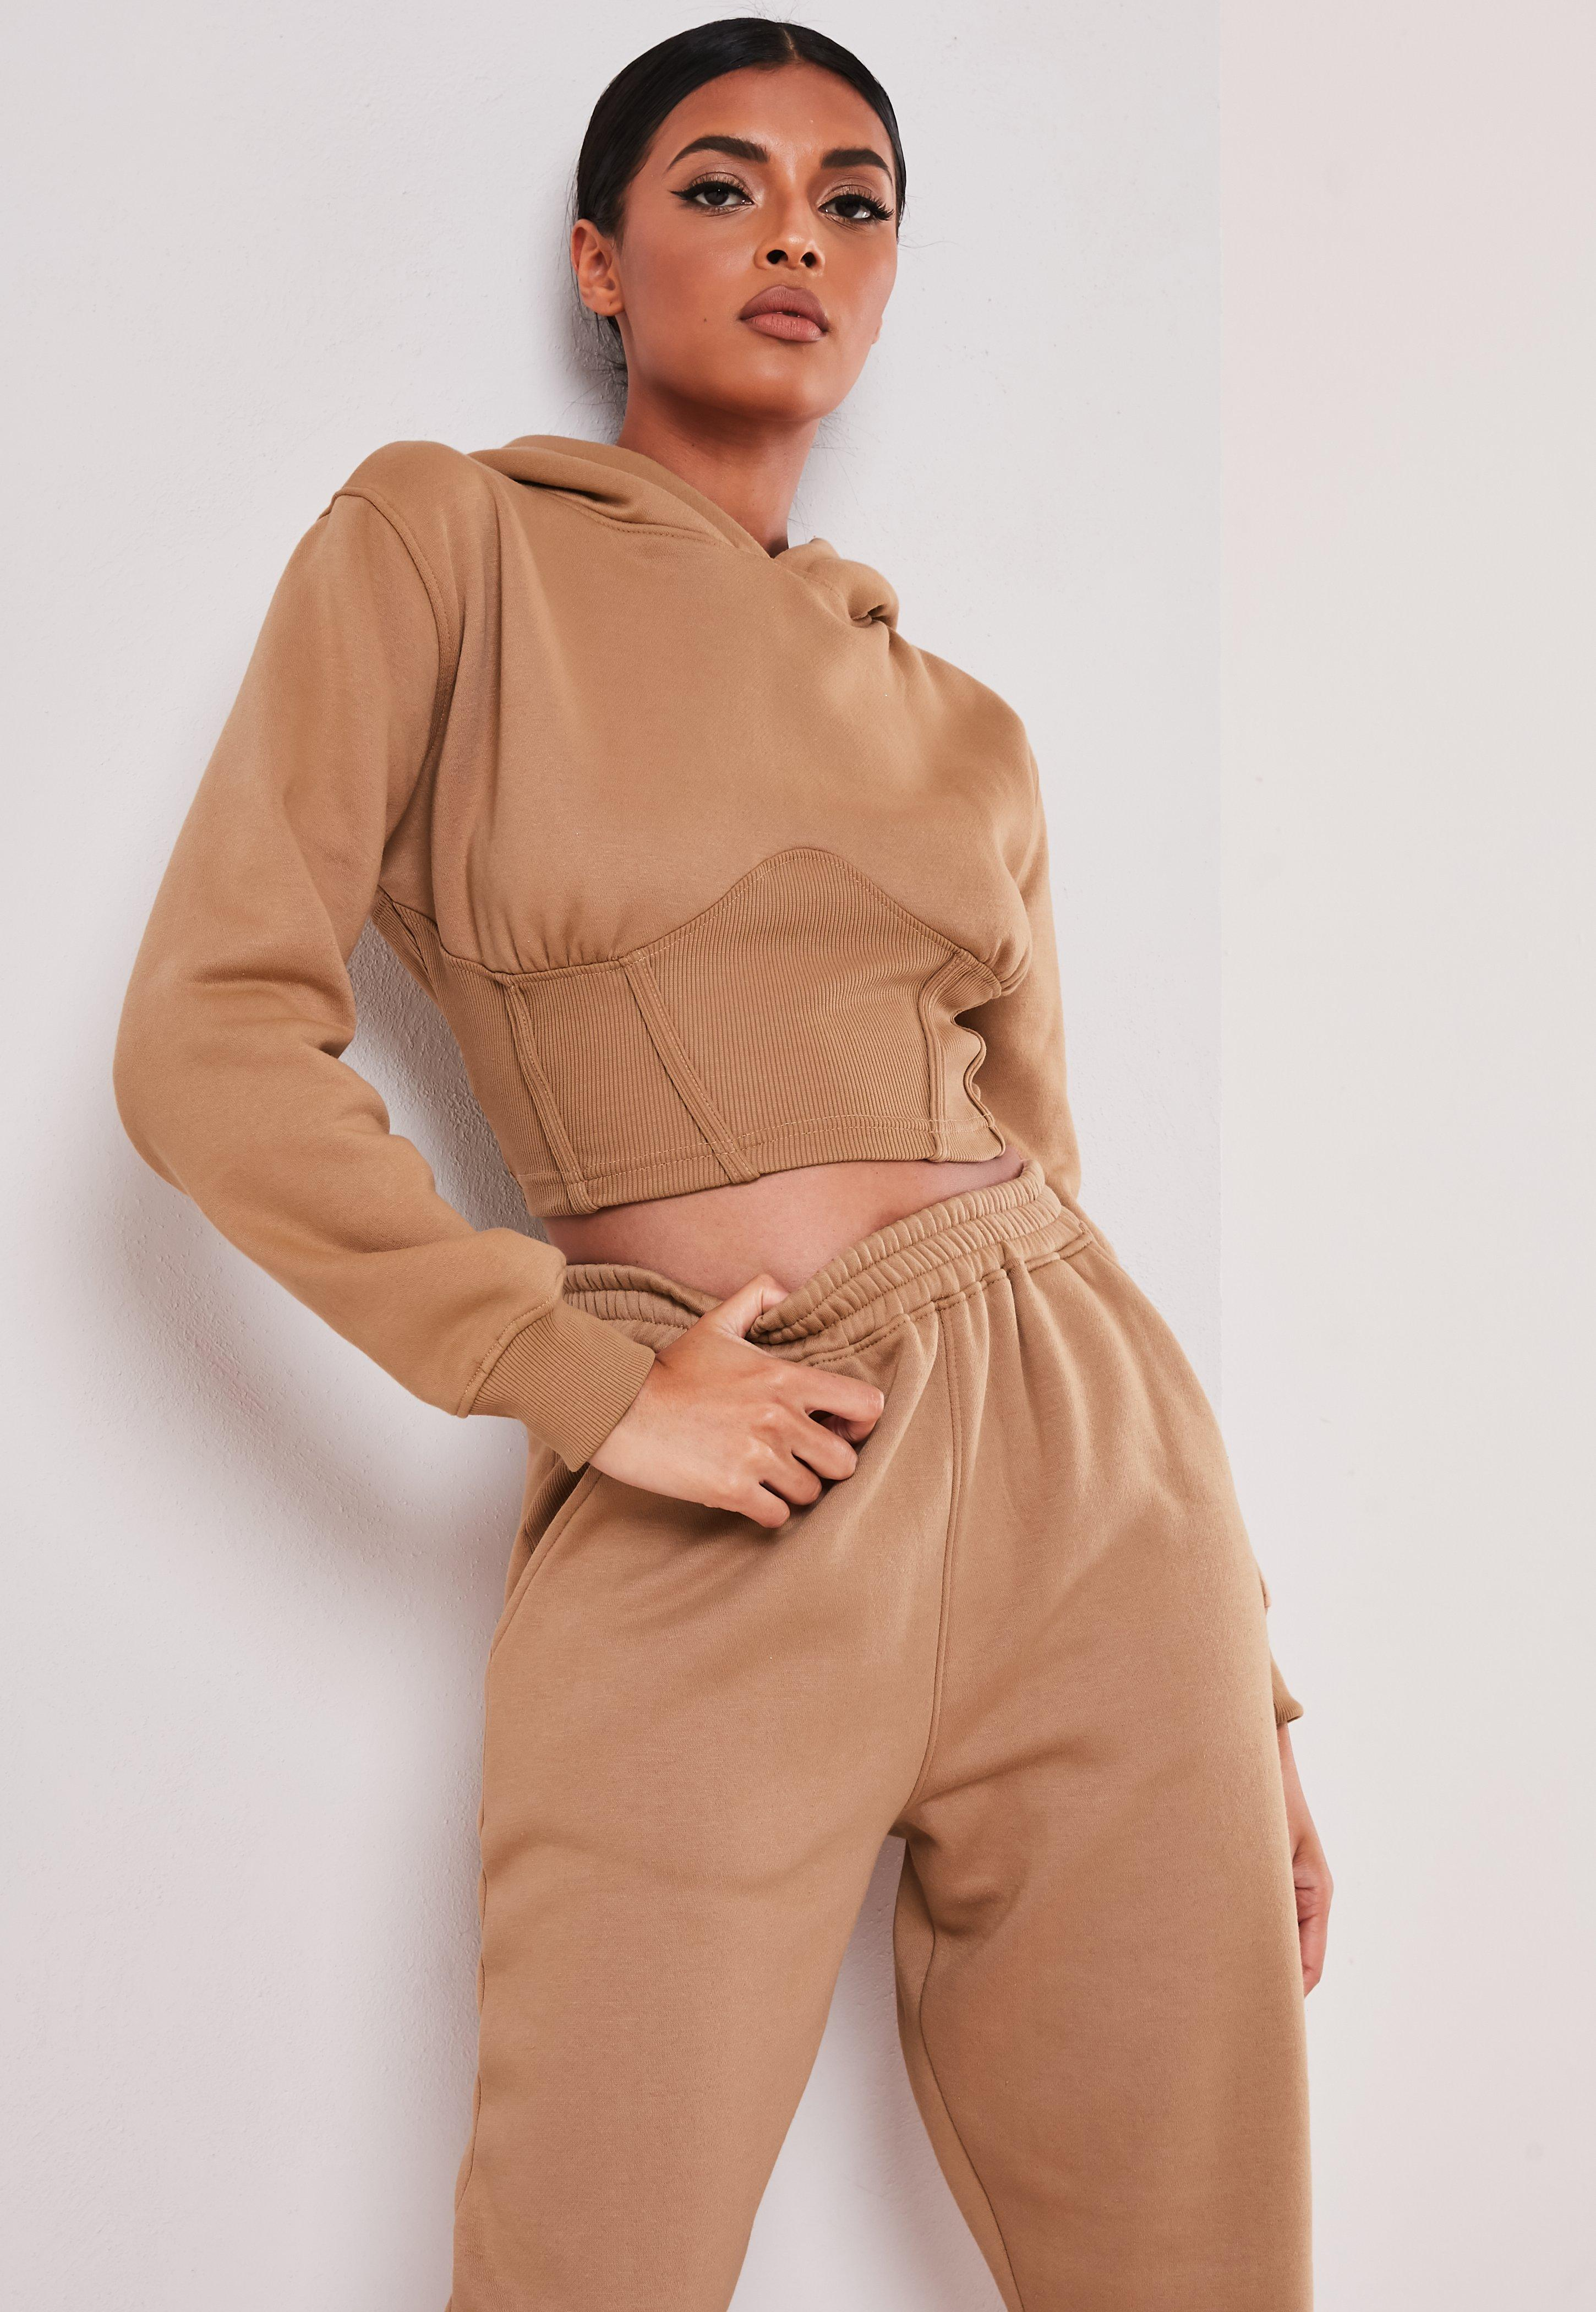 Sofia Richie x Missguided Sweat à capuche taupe style corset